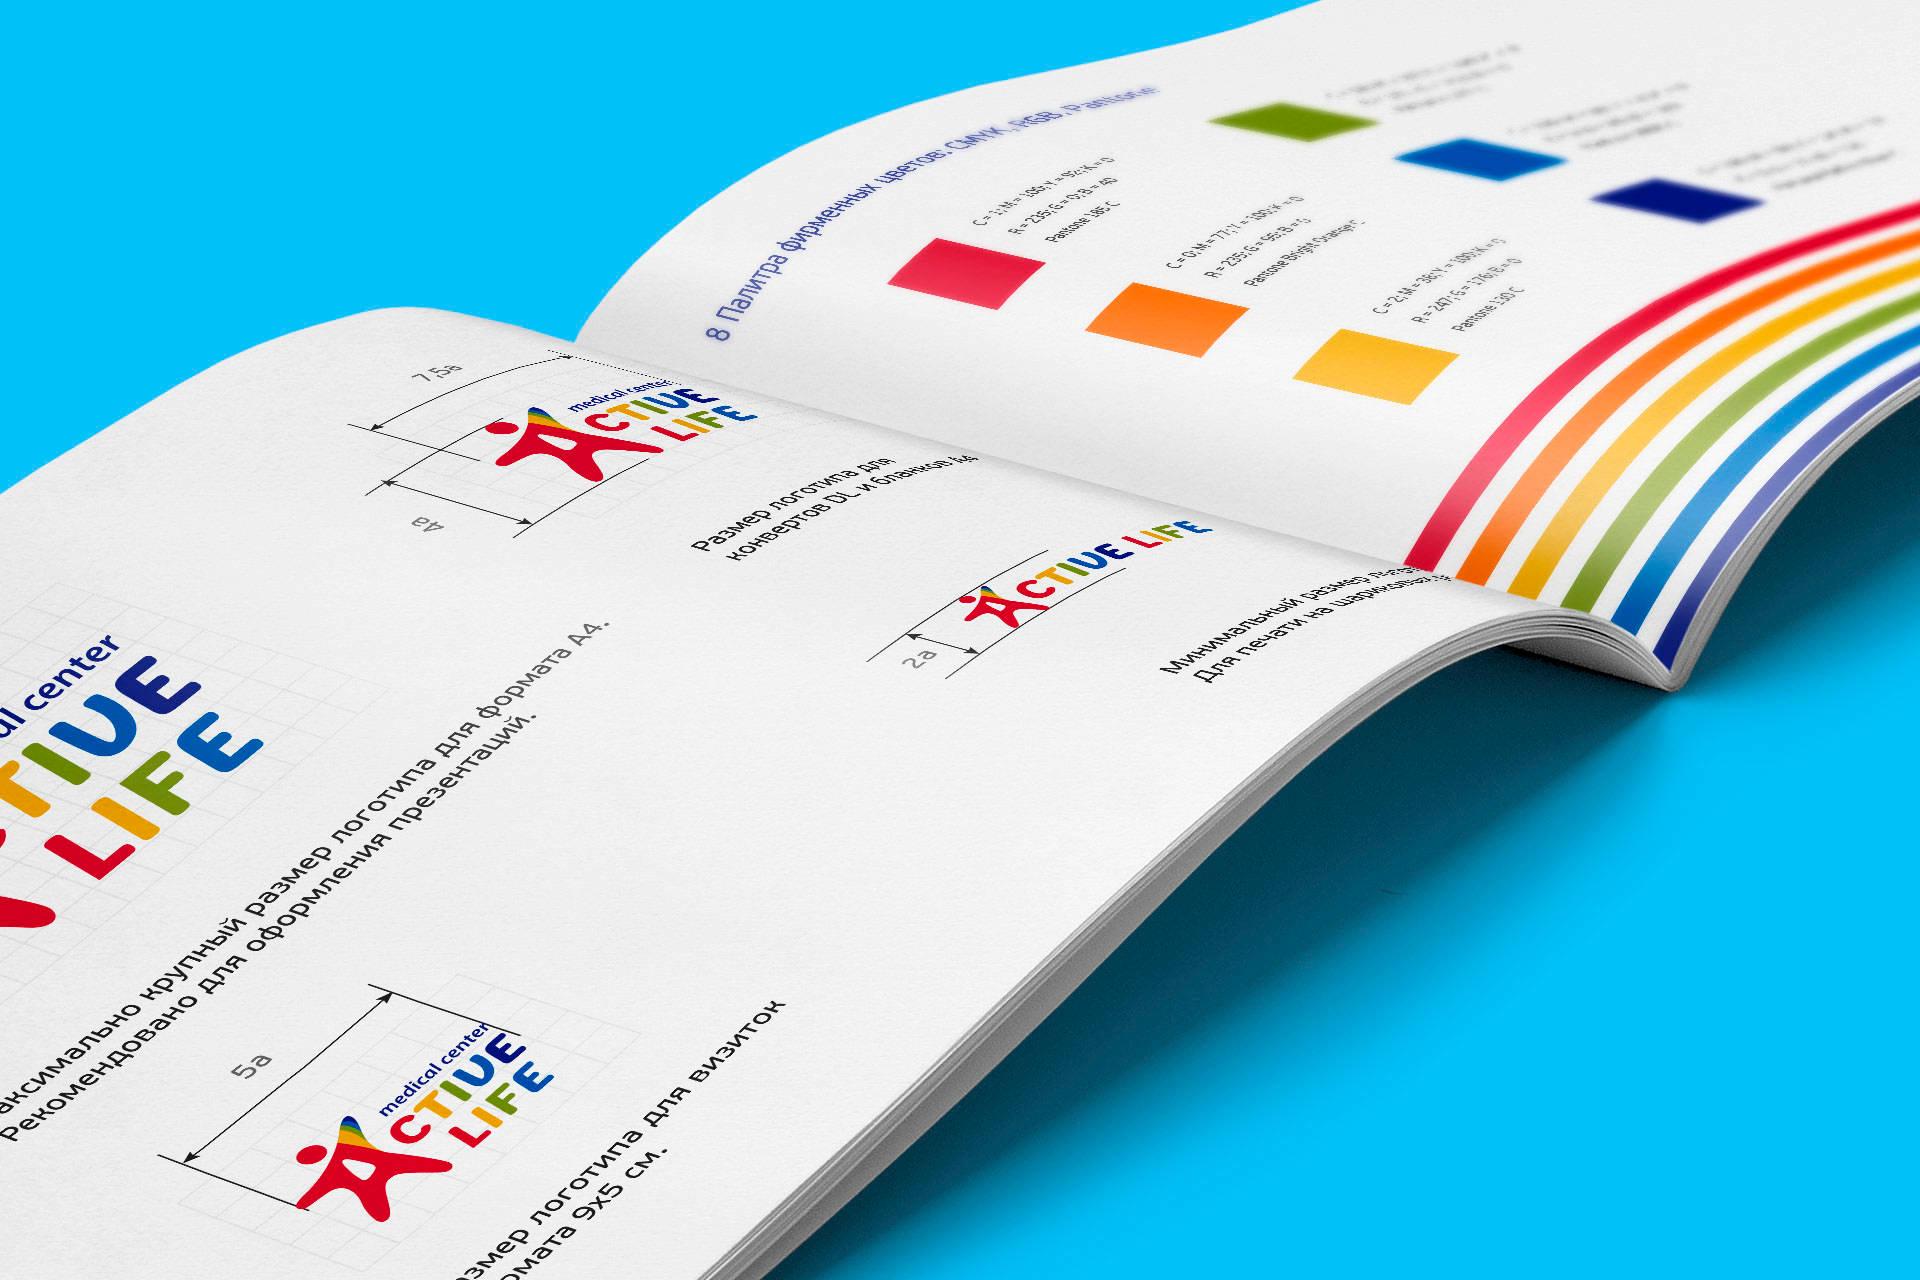 Дизайн брендбука для медицинского центра, Brand book design for medical center